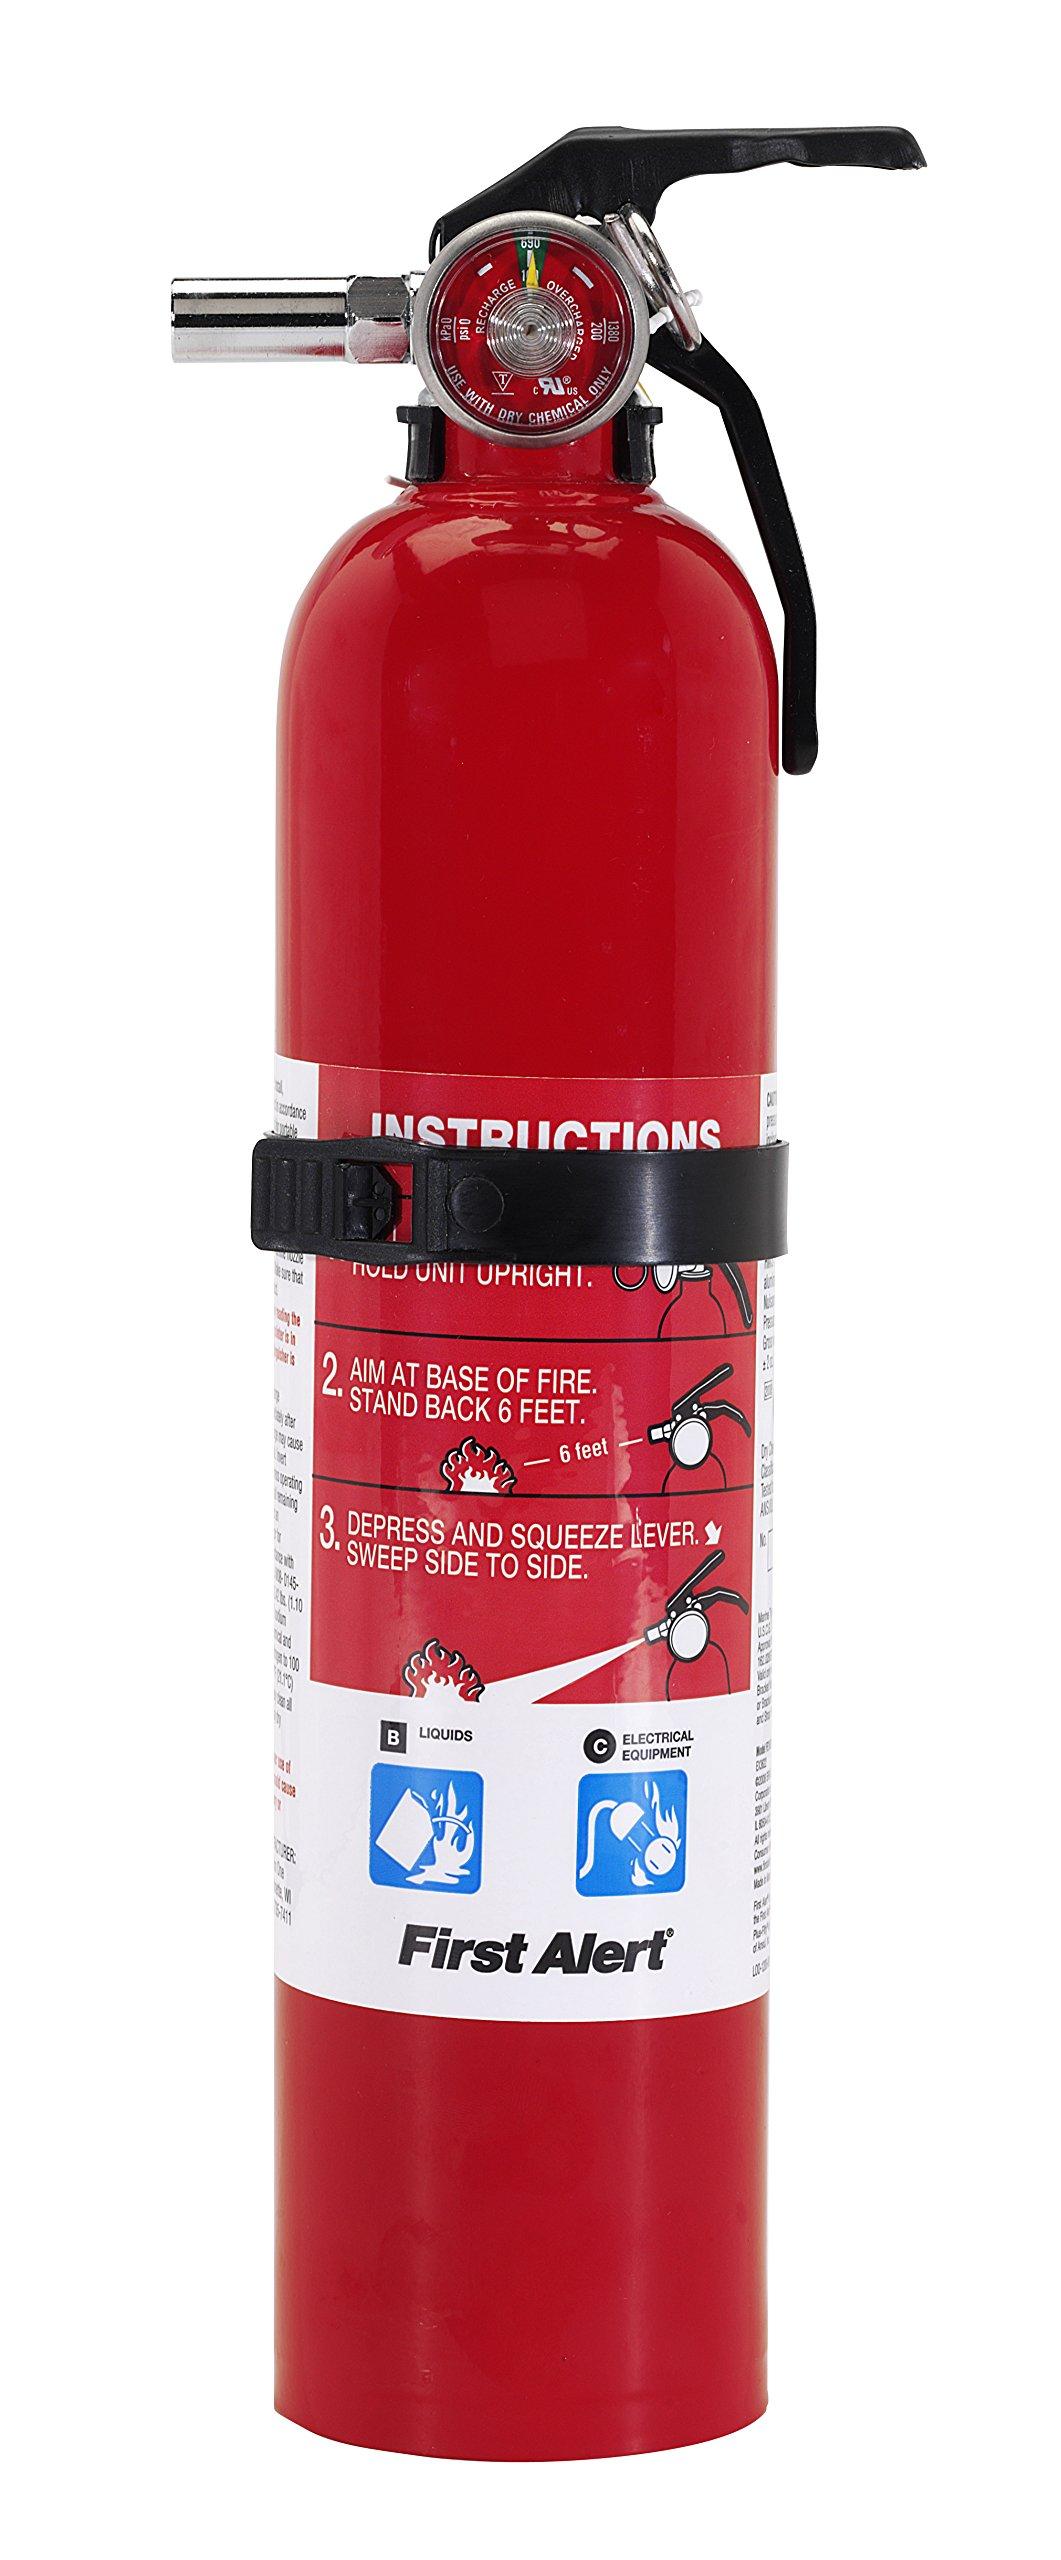 First Alert FE10GO Garage/Workshop Fire Extinguisher, Red